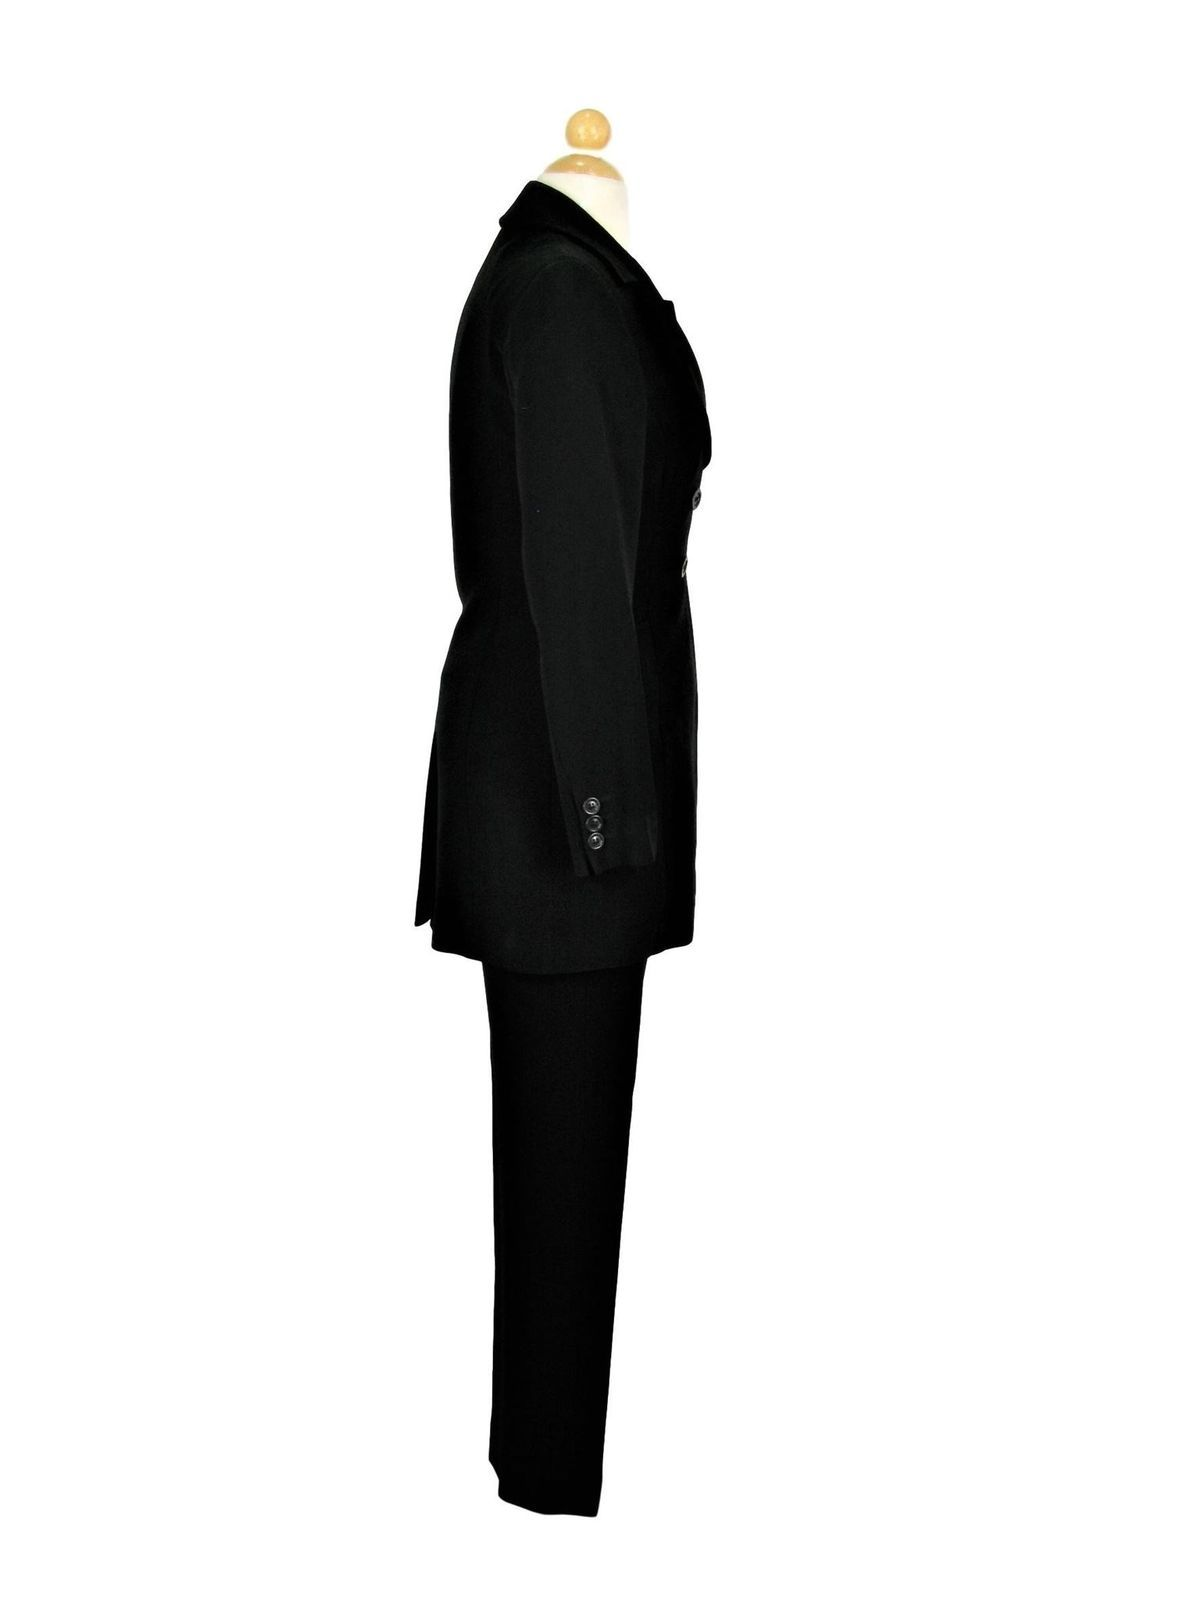 Pant Suit Long Fitted Blazer Capri Pants Karen Millen Black Crepe UK 8 $595 MSRP